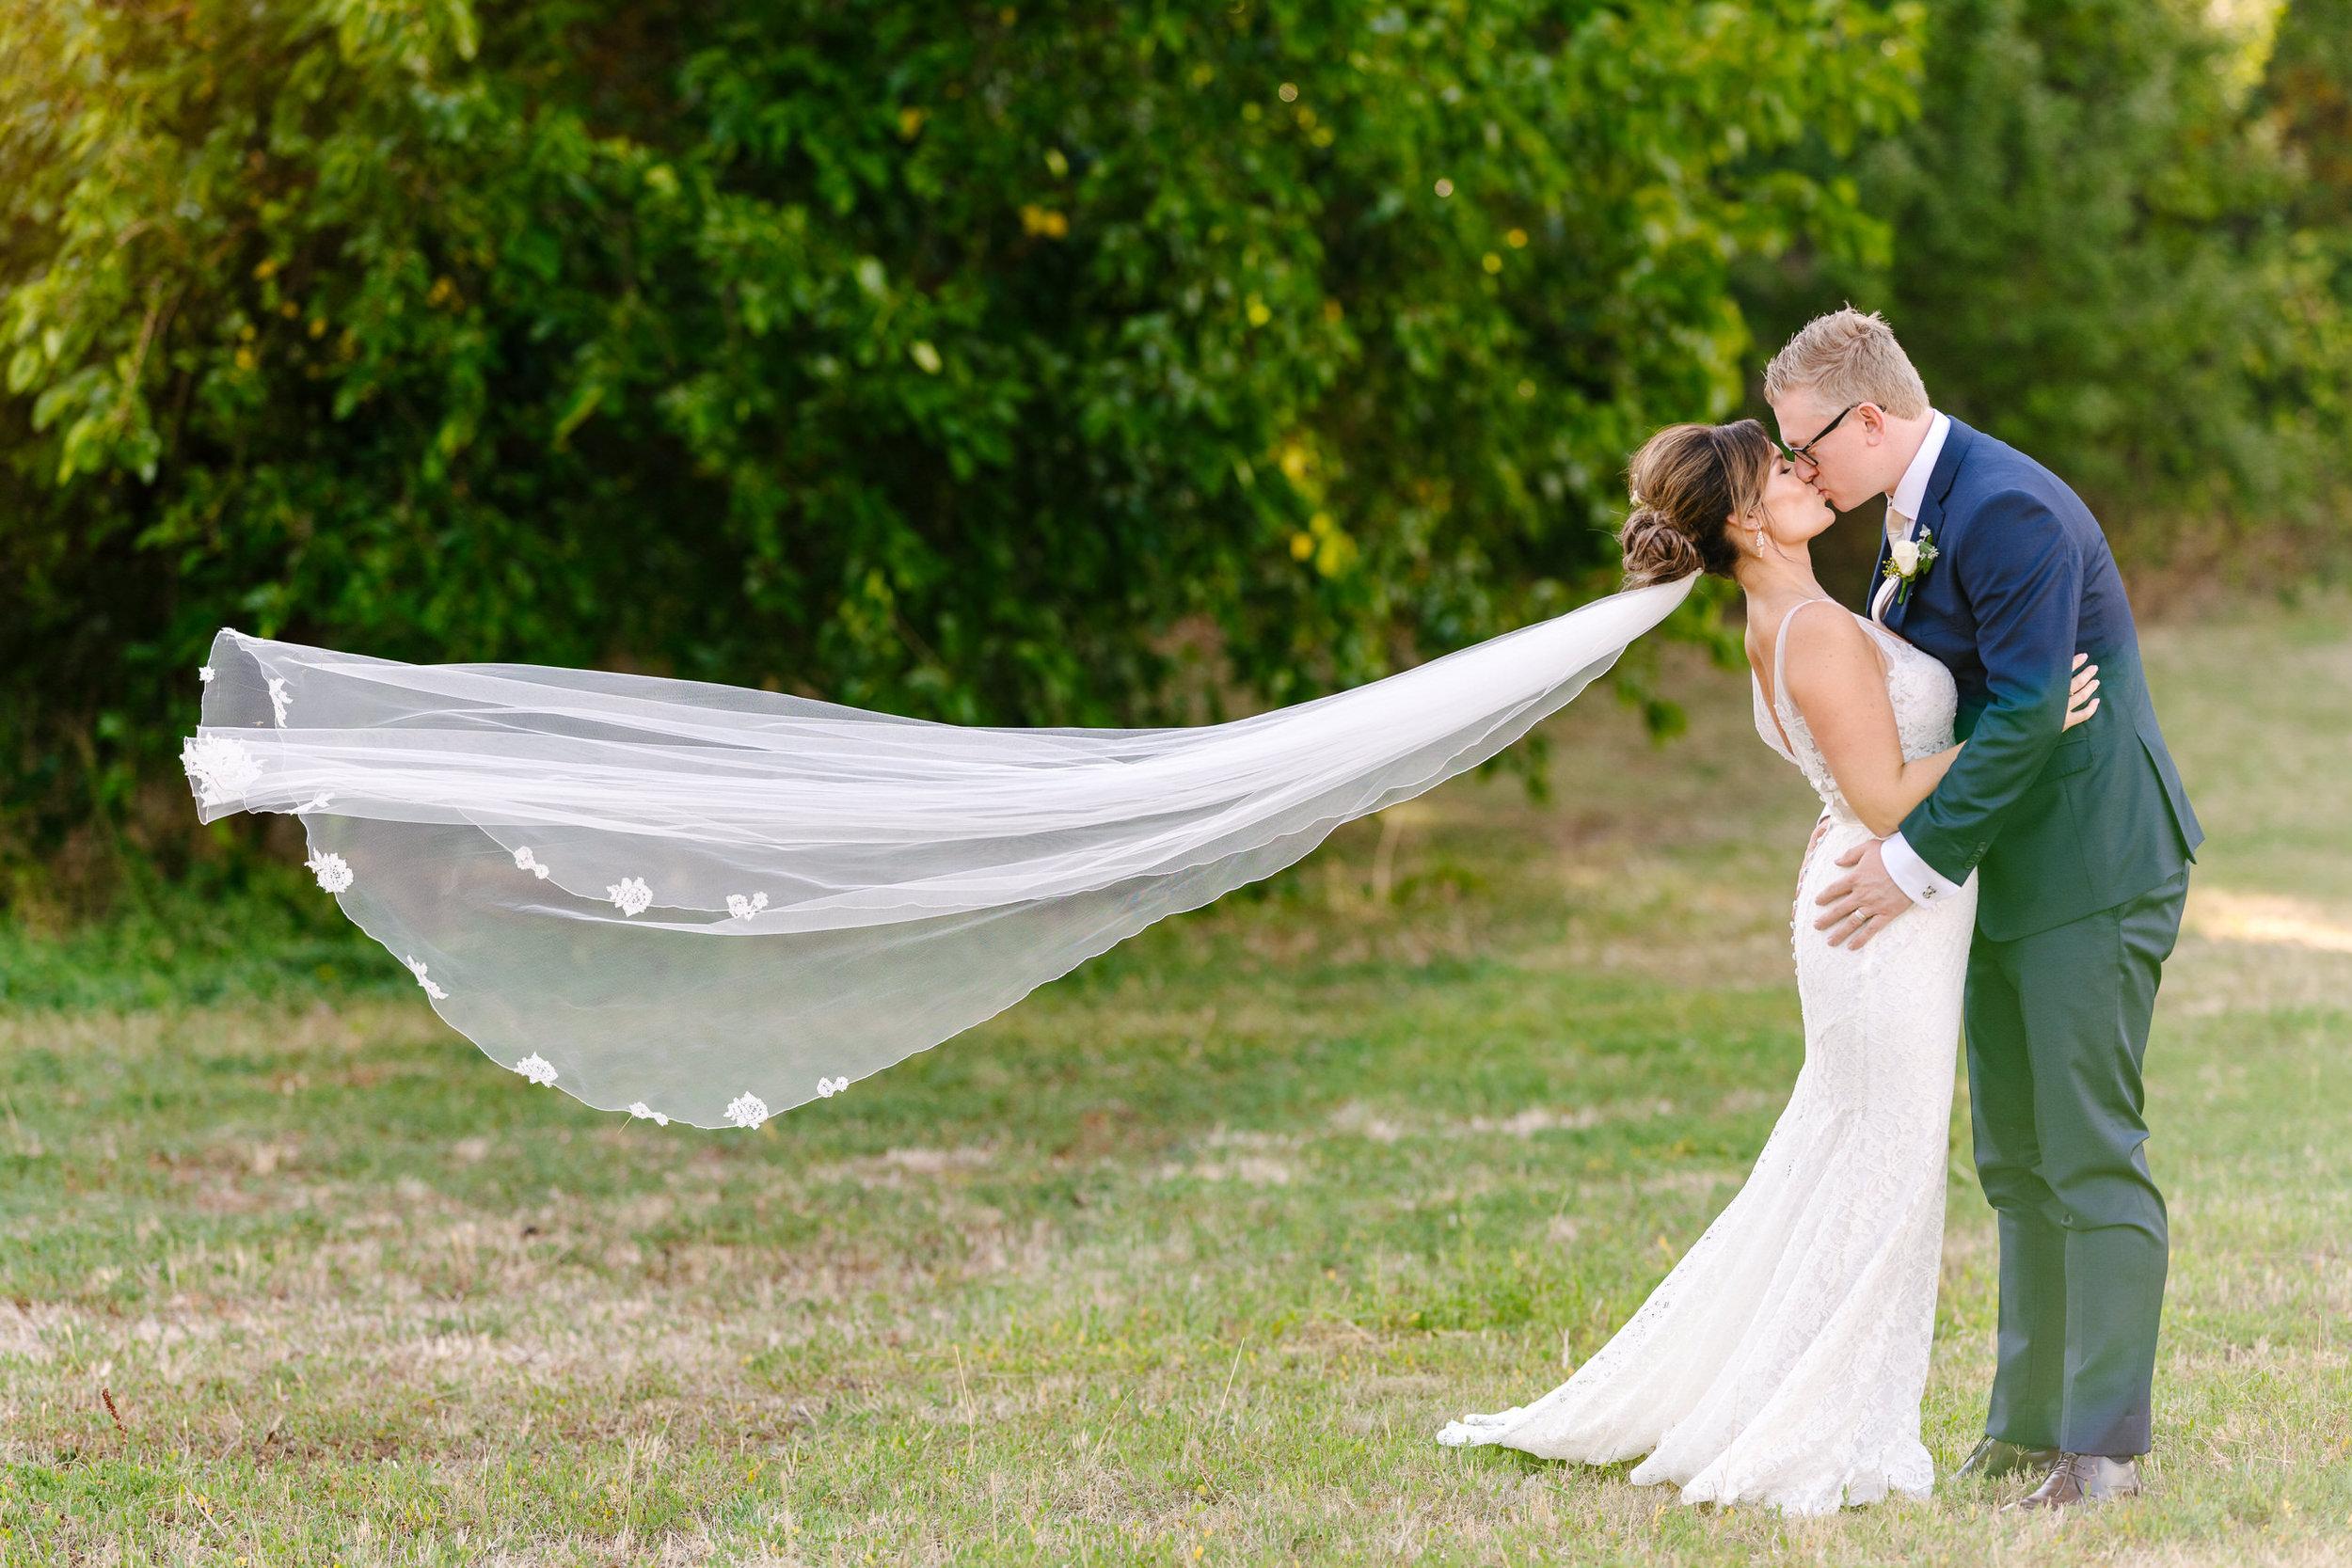 Justin_And_Jim_Photography_Chateau_Dore_Bendigo_Wedding68.JPG